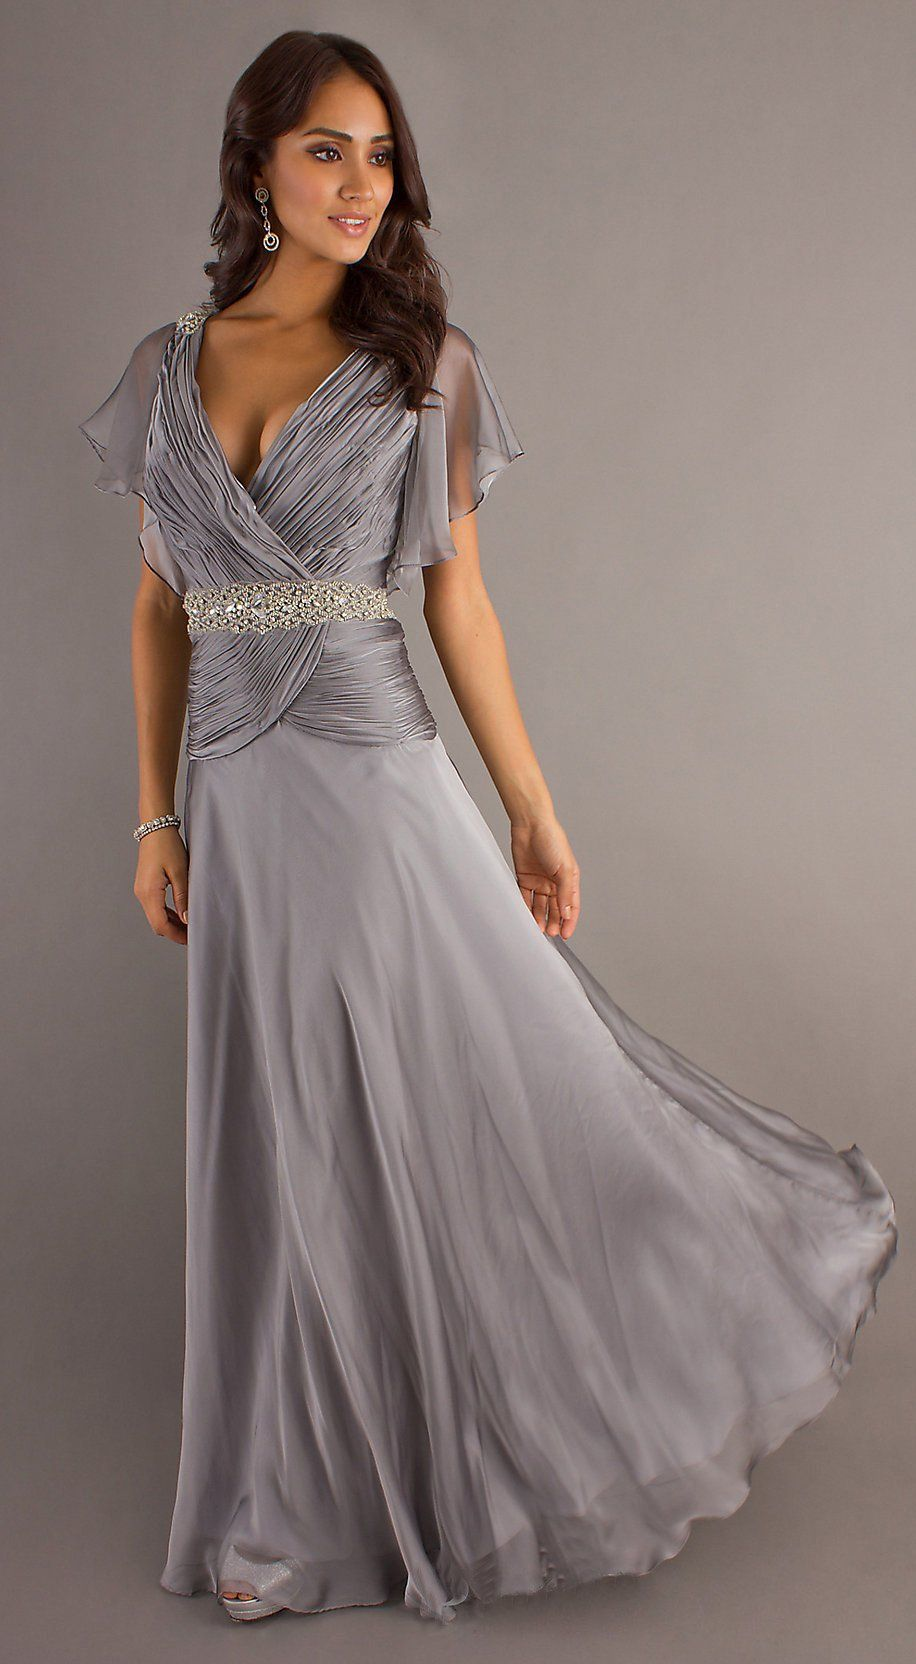 Modest long silver formal gown v neckline short sleeve